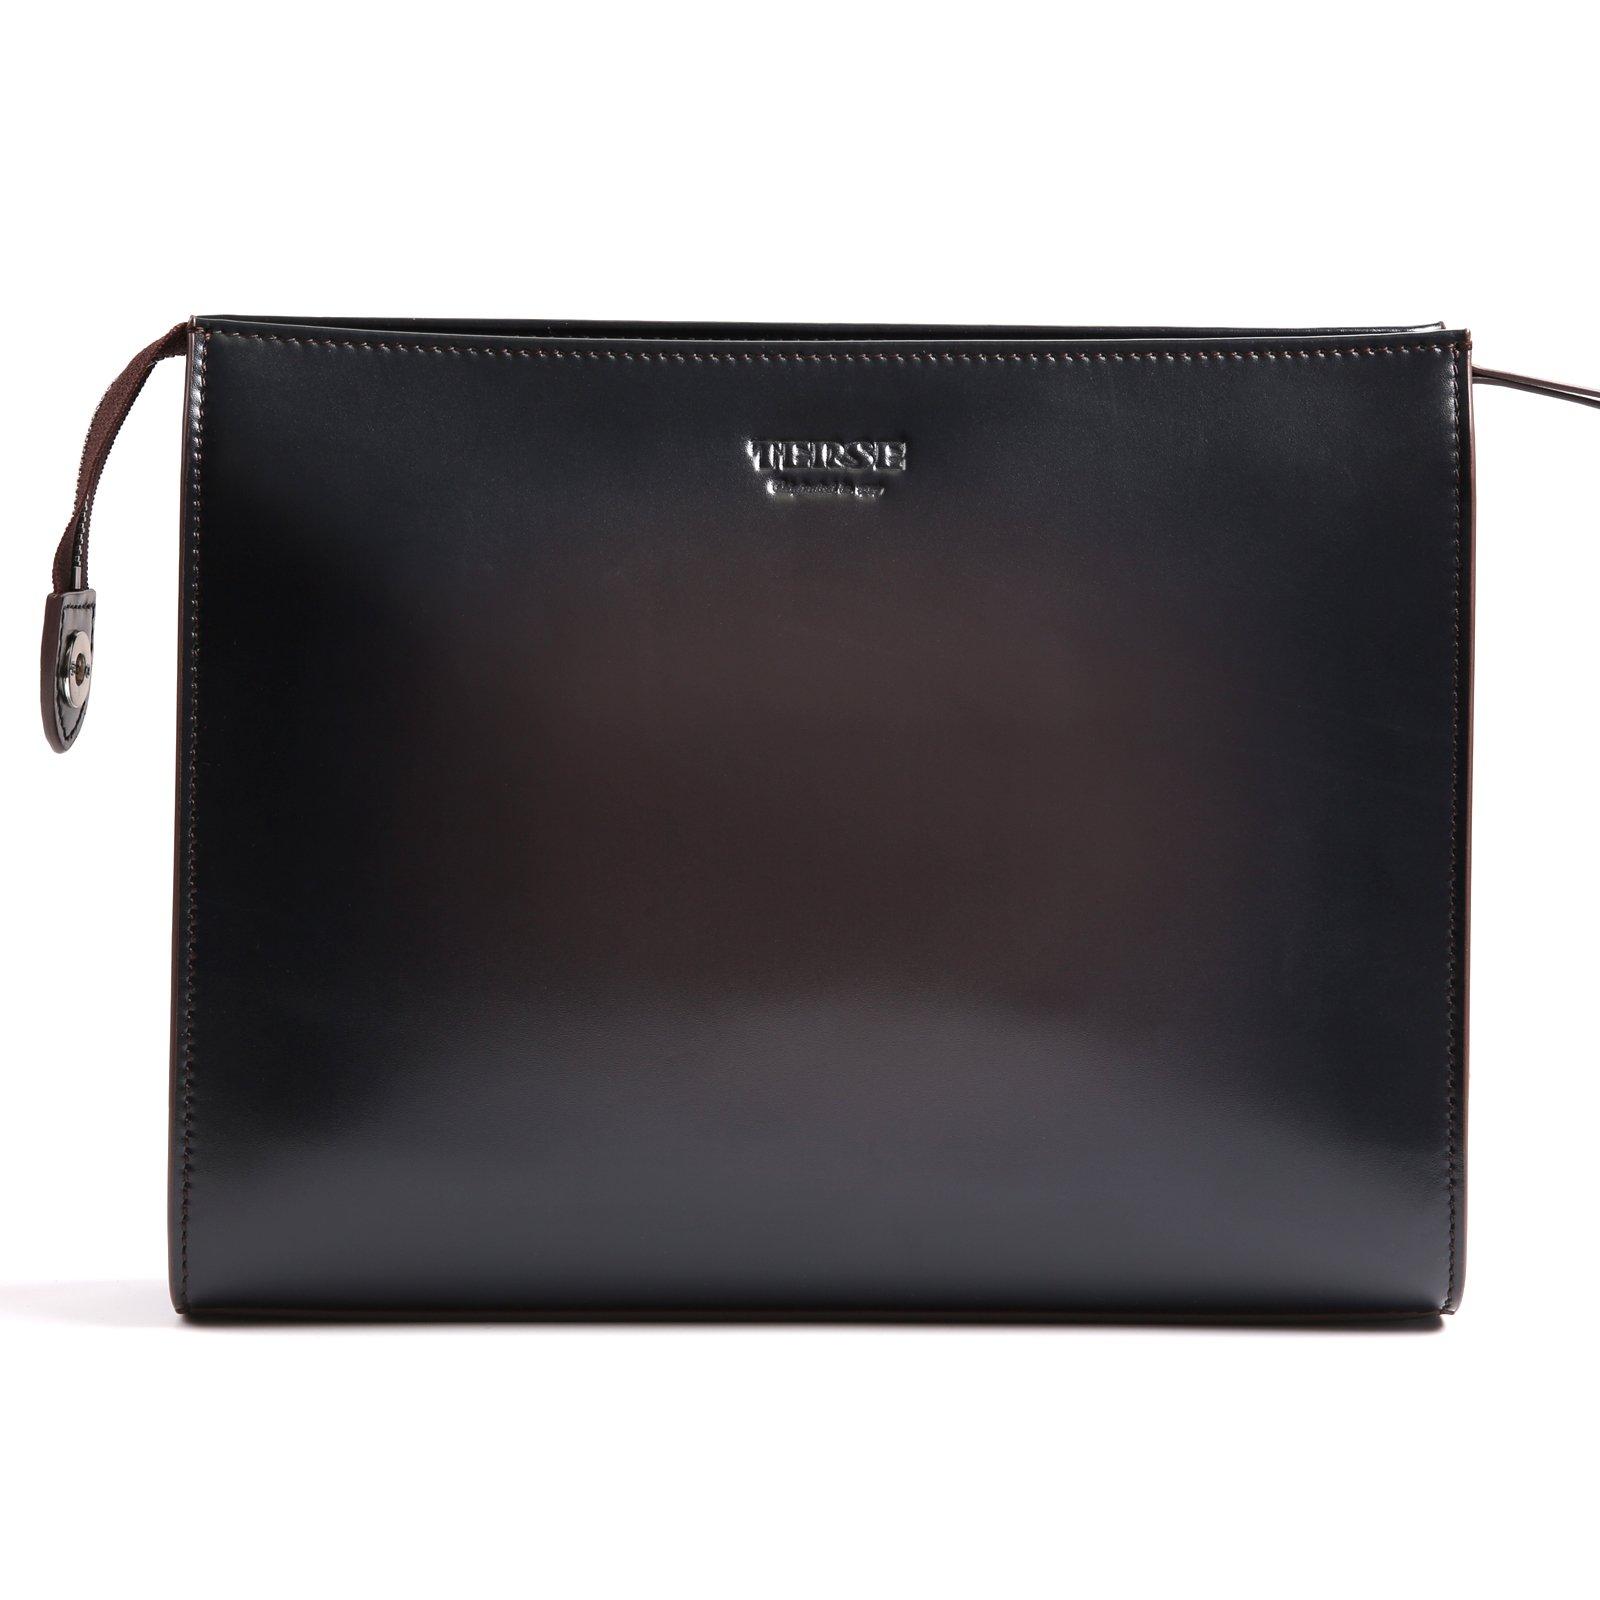 TERSE Genuine Leather Clutch Bag Handmade Card Cash Holder Business Handbag Zipper Wallets Manual Brush-off(Iron Grey) TS601A